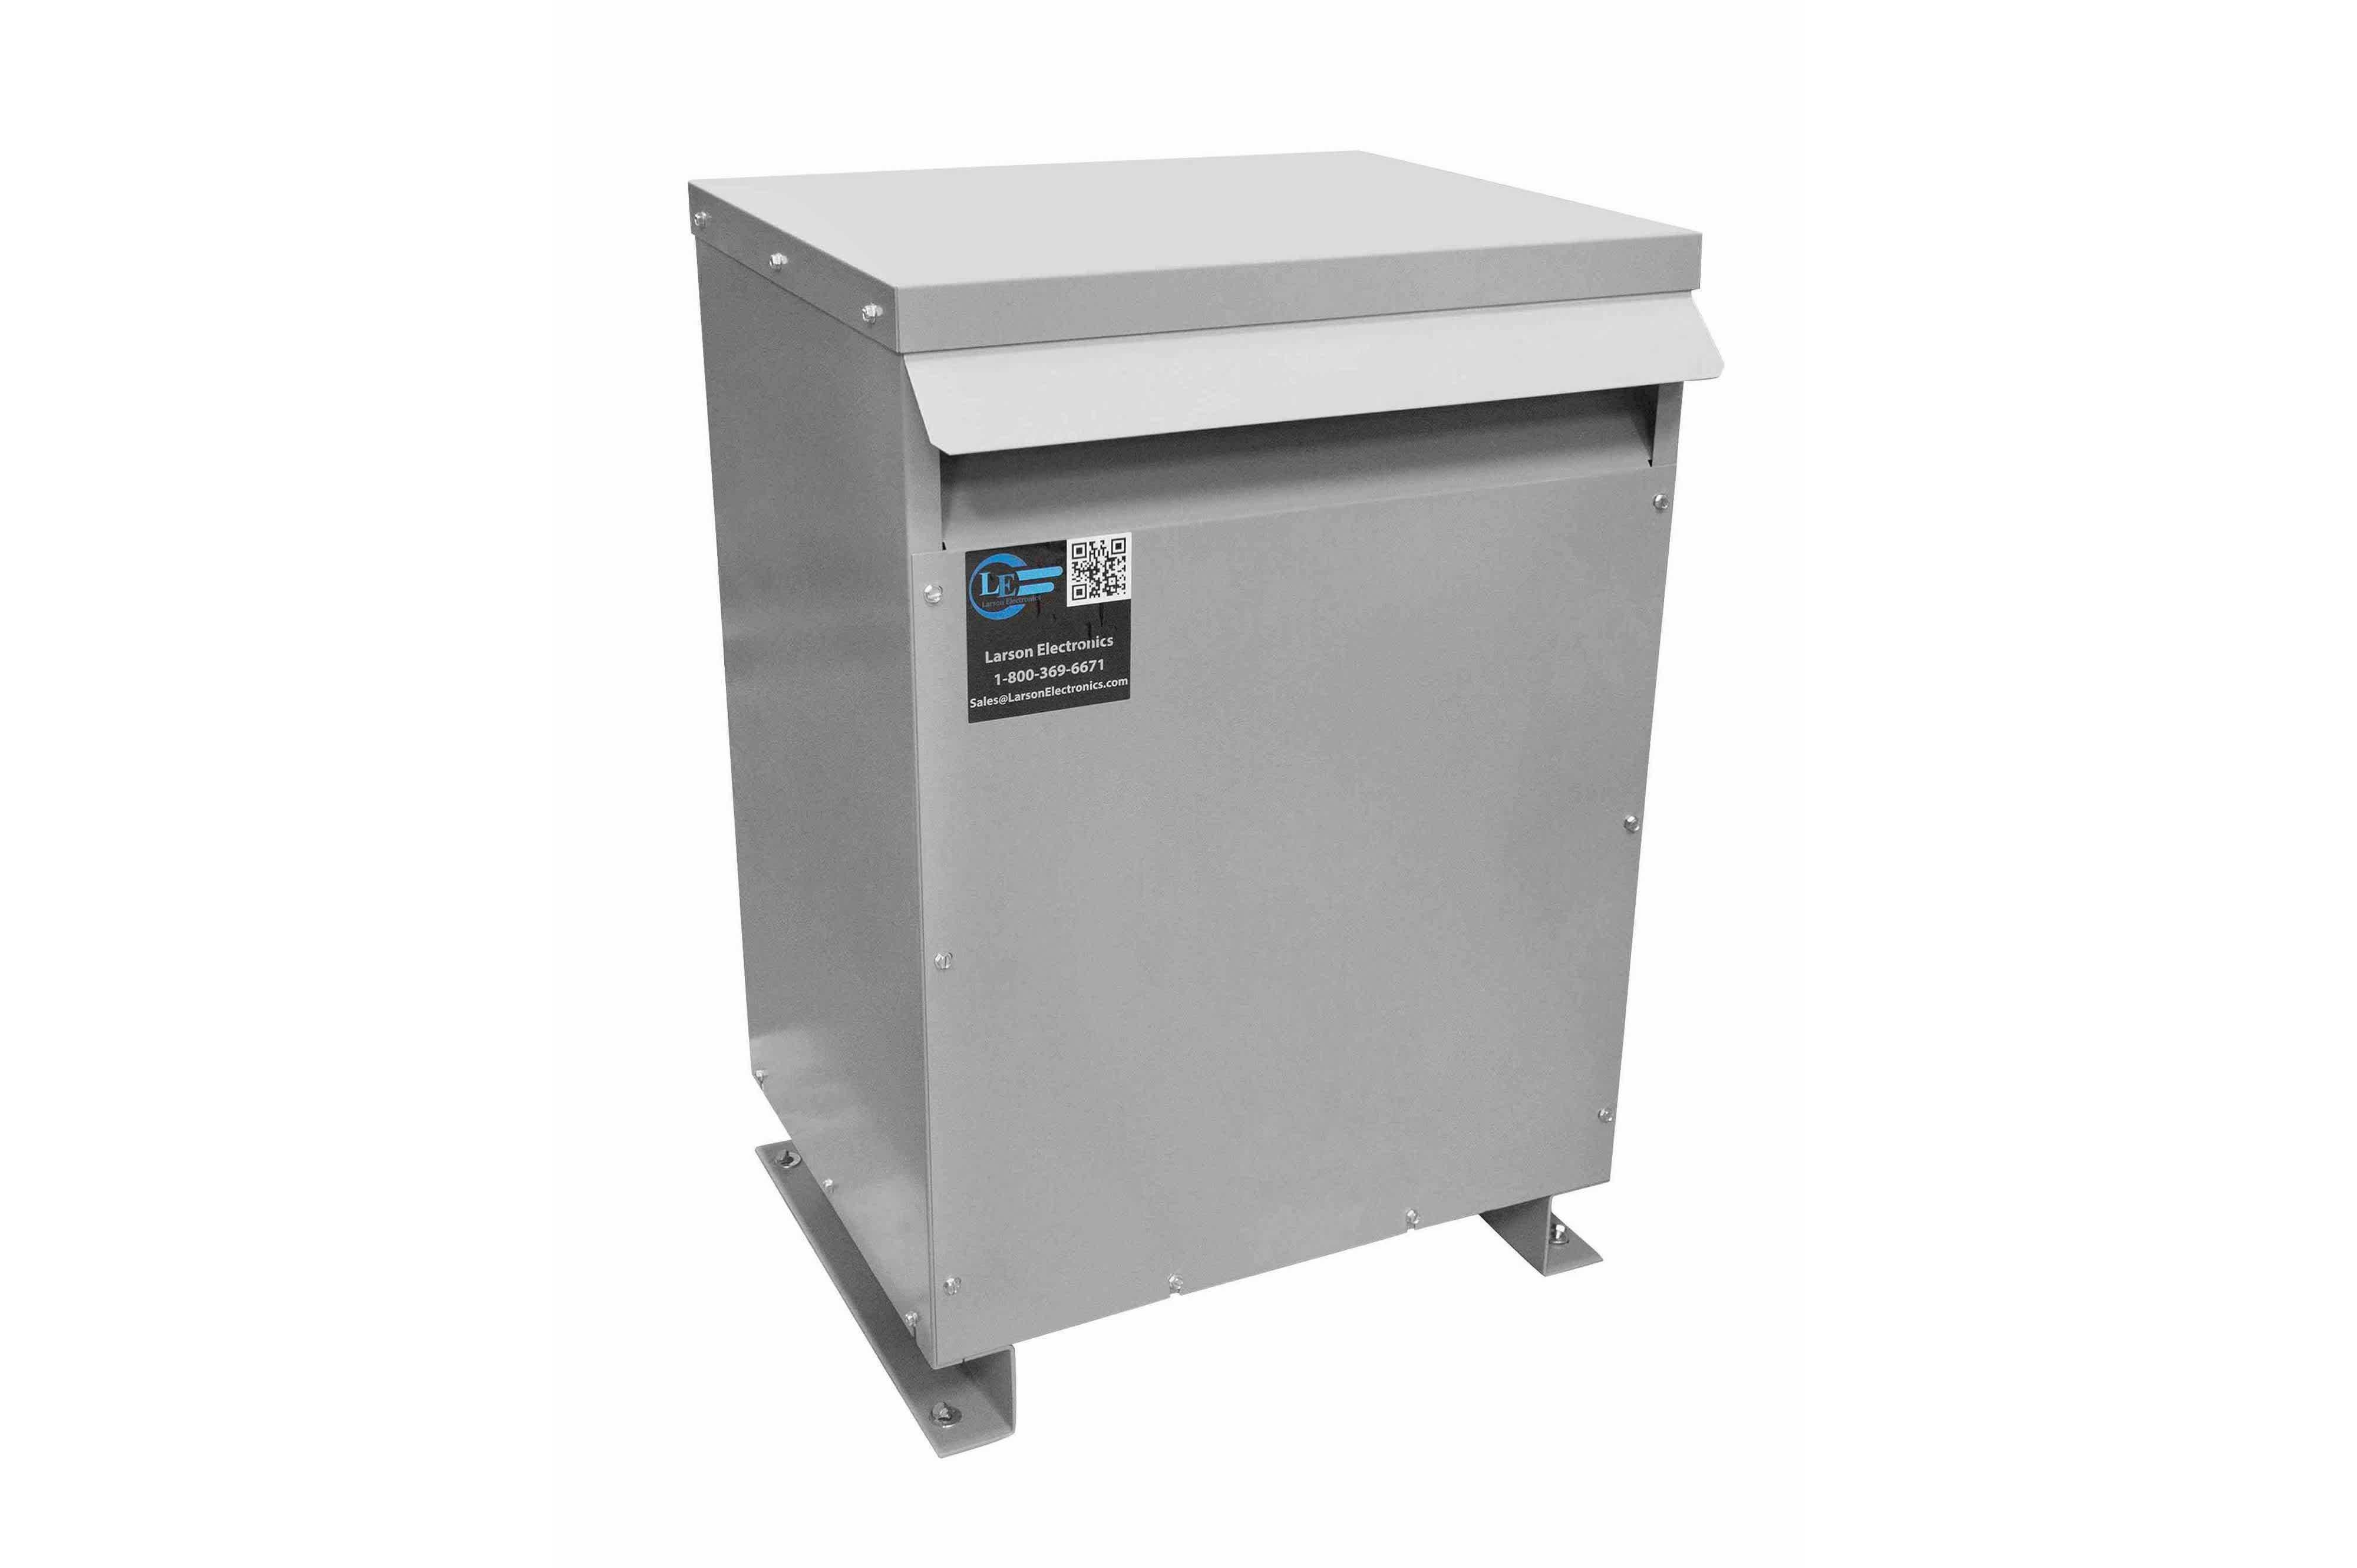 500 kVA 3PH DOE Transformer, 460V Delta Primary, 600Y/347 Wye-N Secondary, N3R, Ventilated, 60 Hz